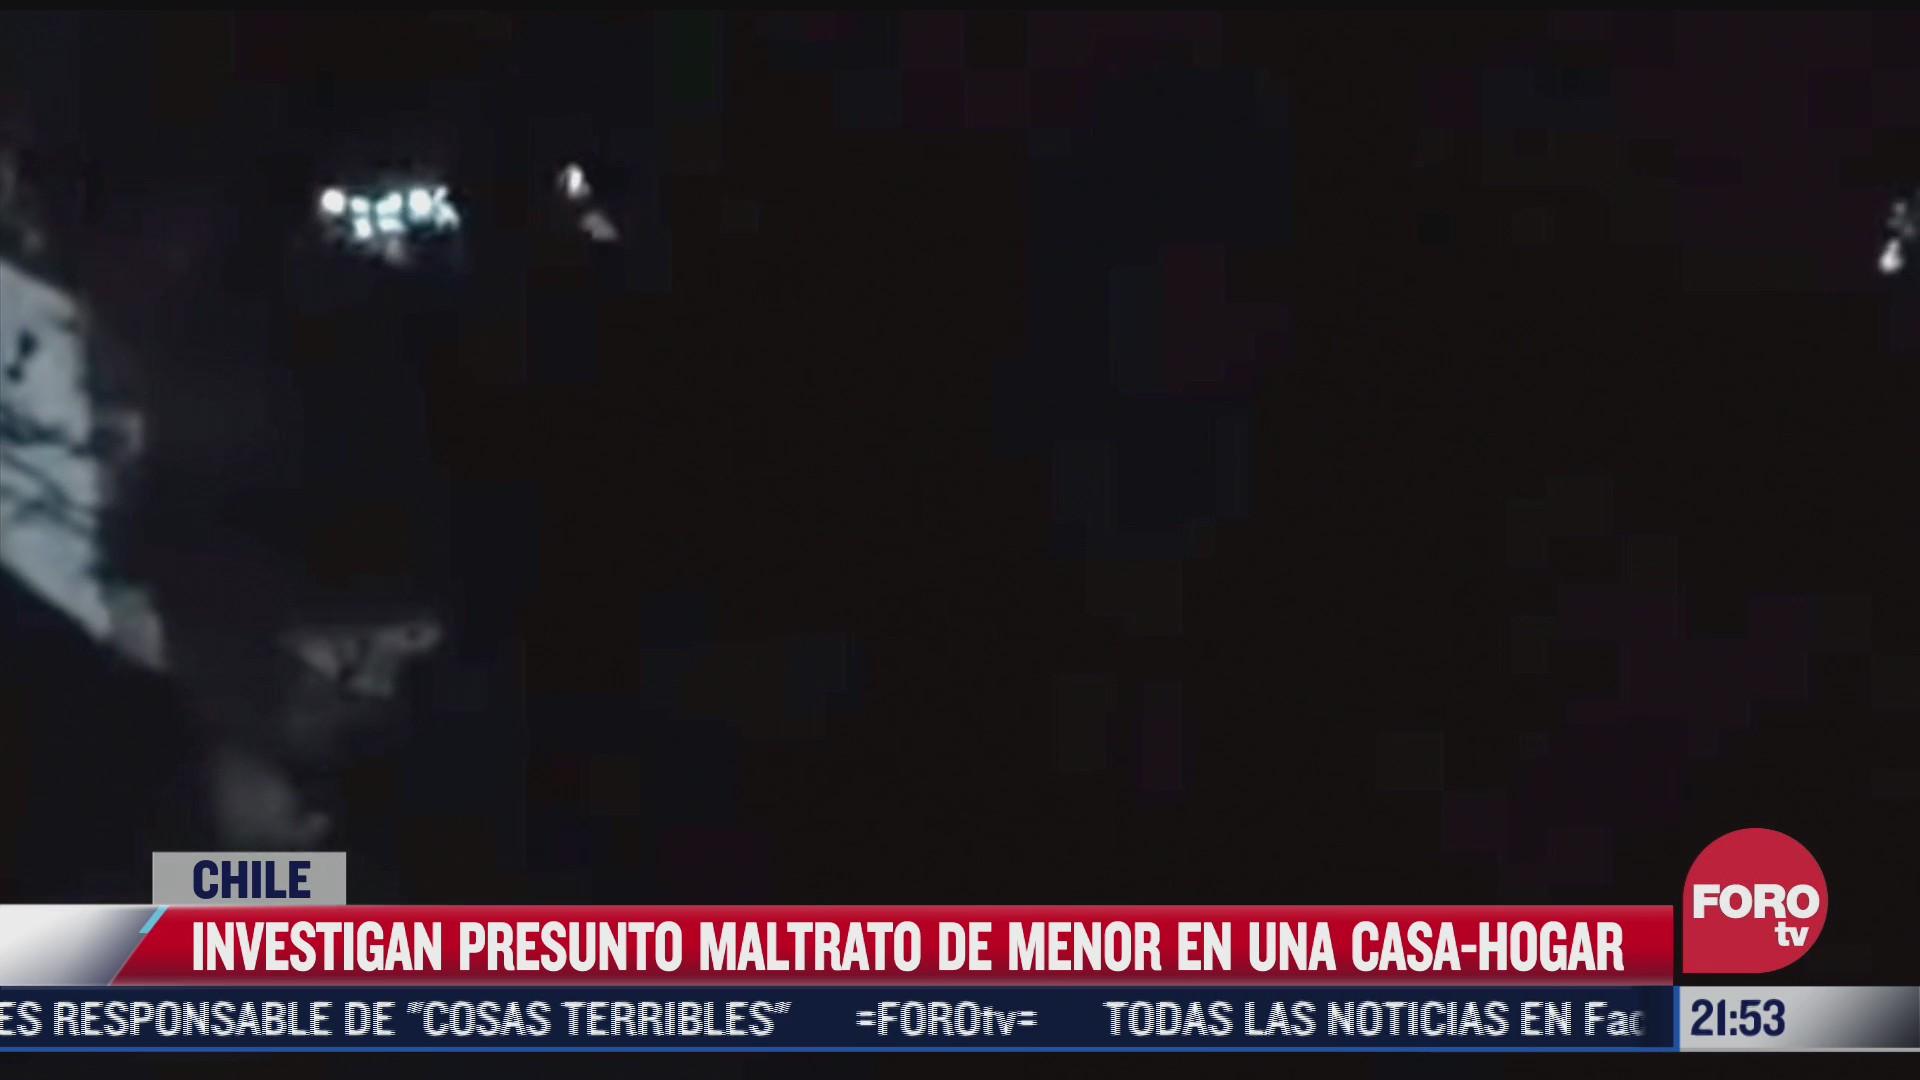 difunden presunto caso de maltrato a menor de edad en casa hogar de chile